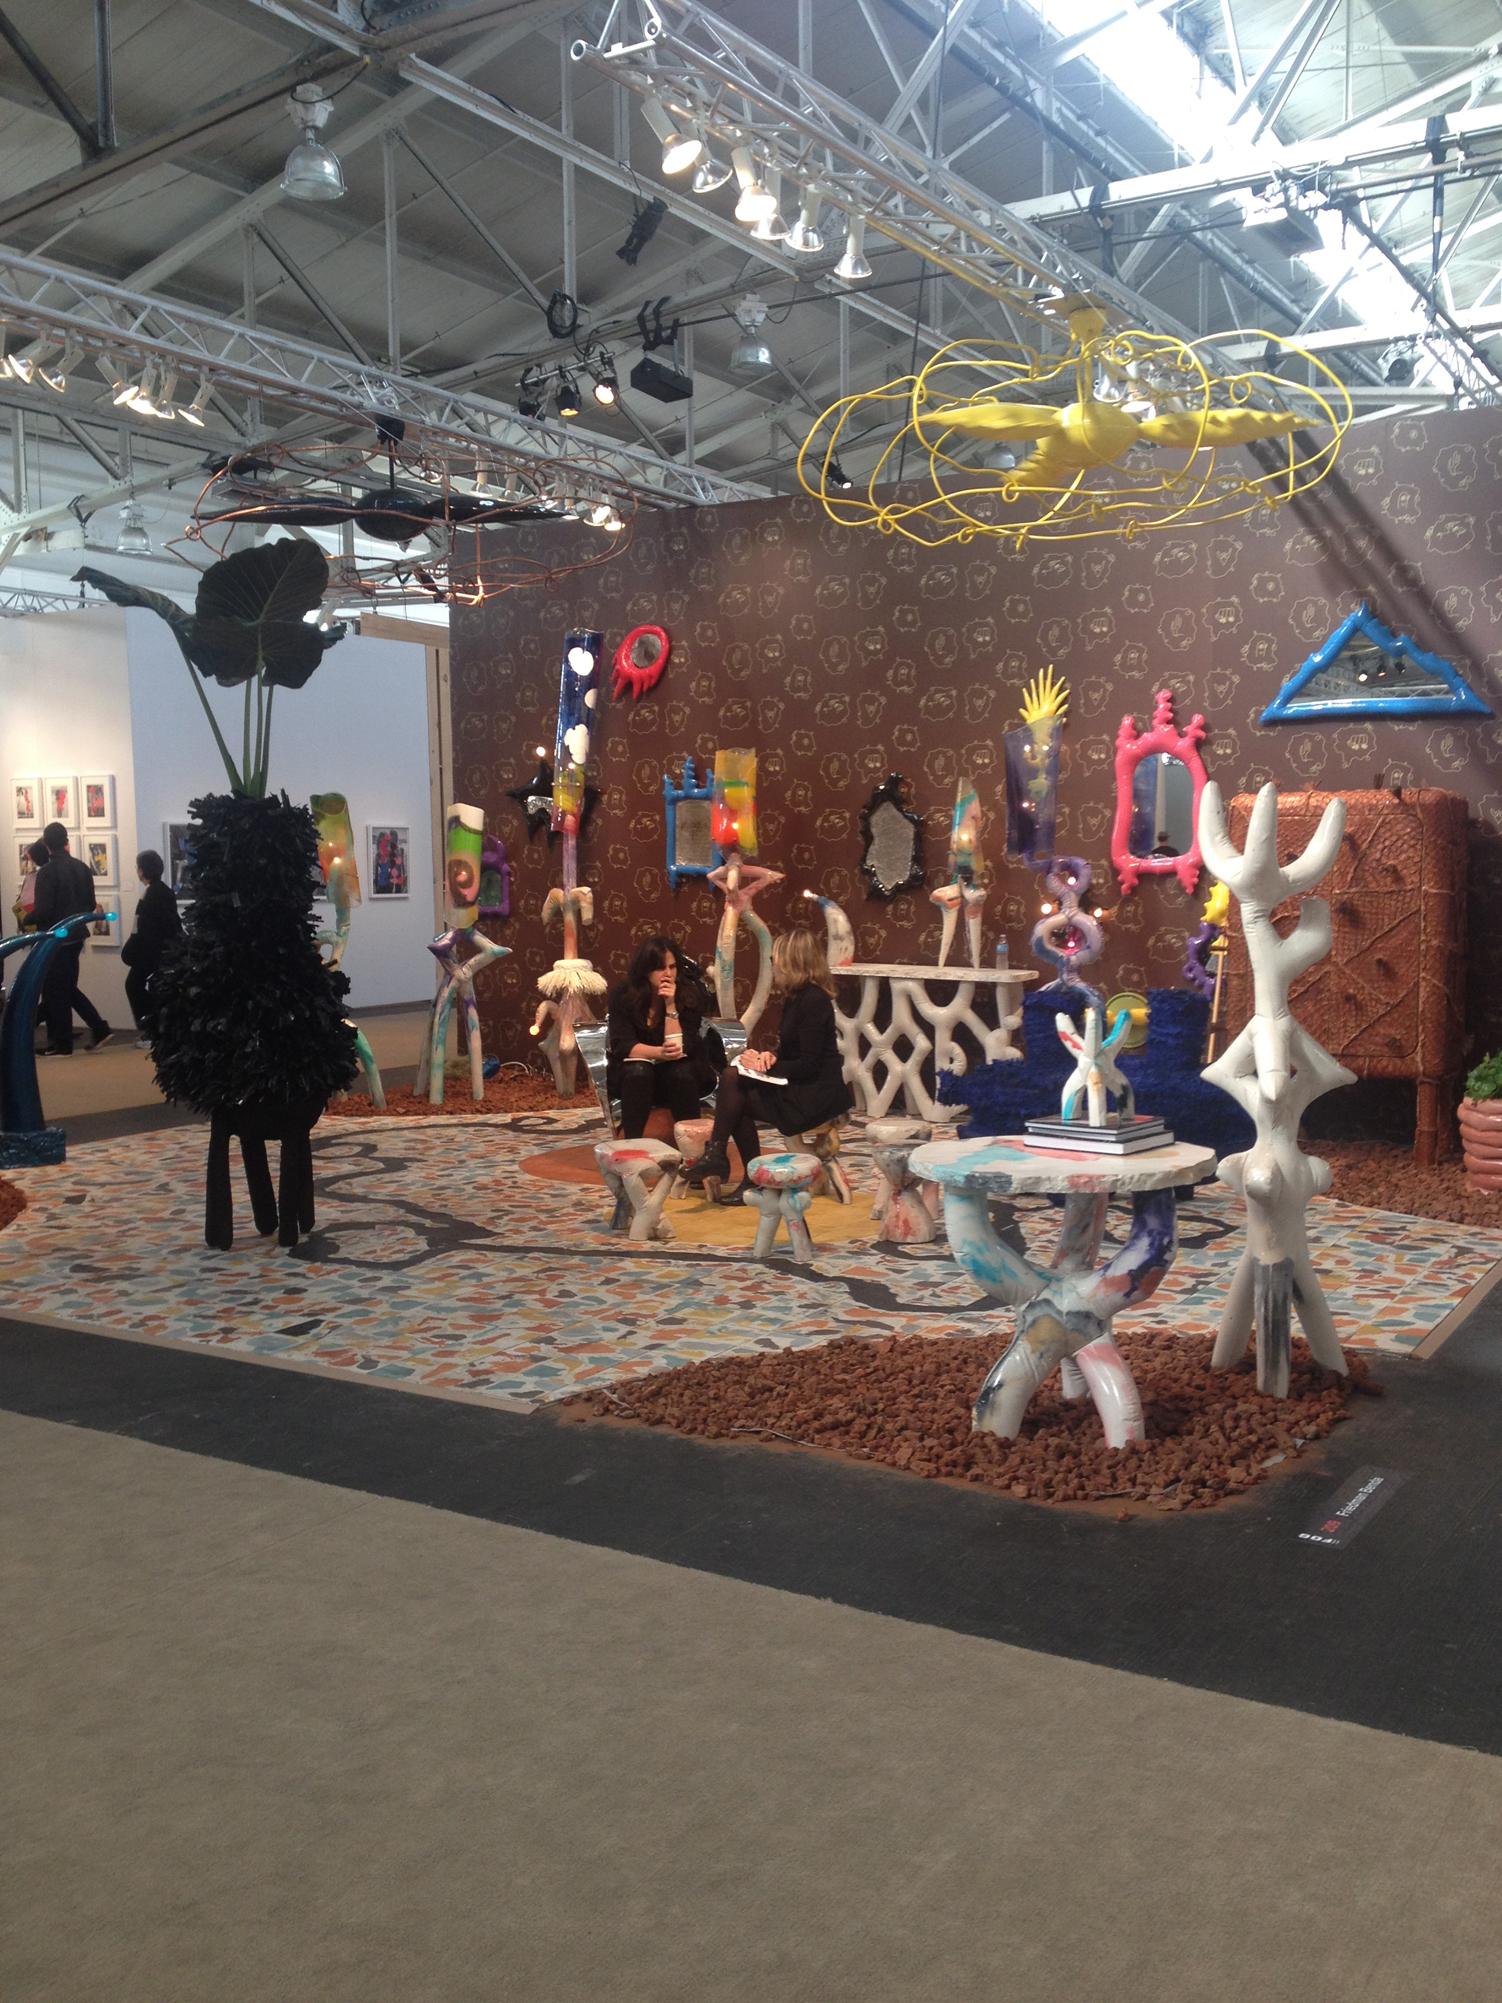 Installation by Misha Kahn for Friedman Benda